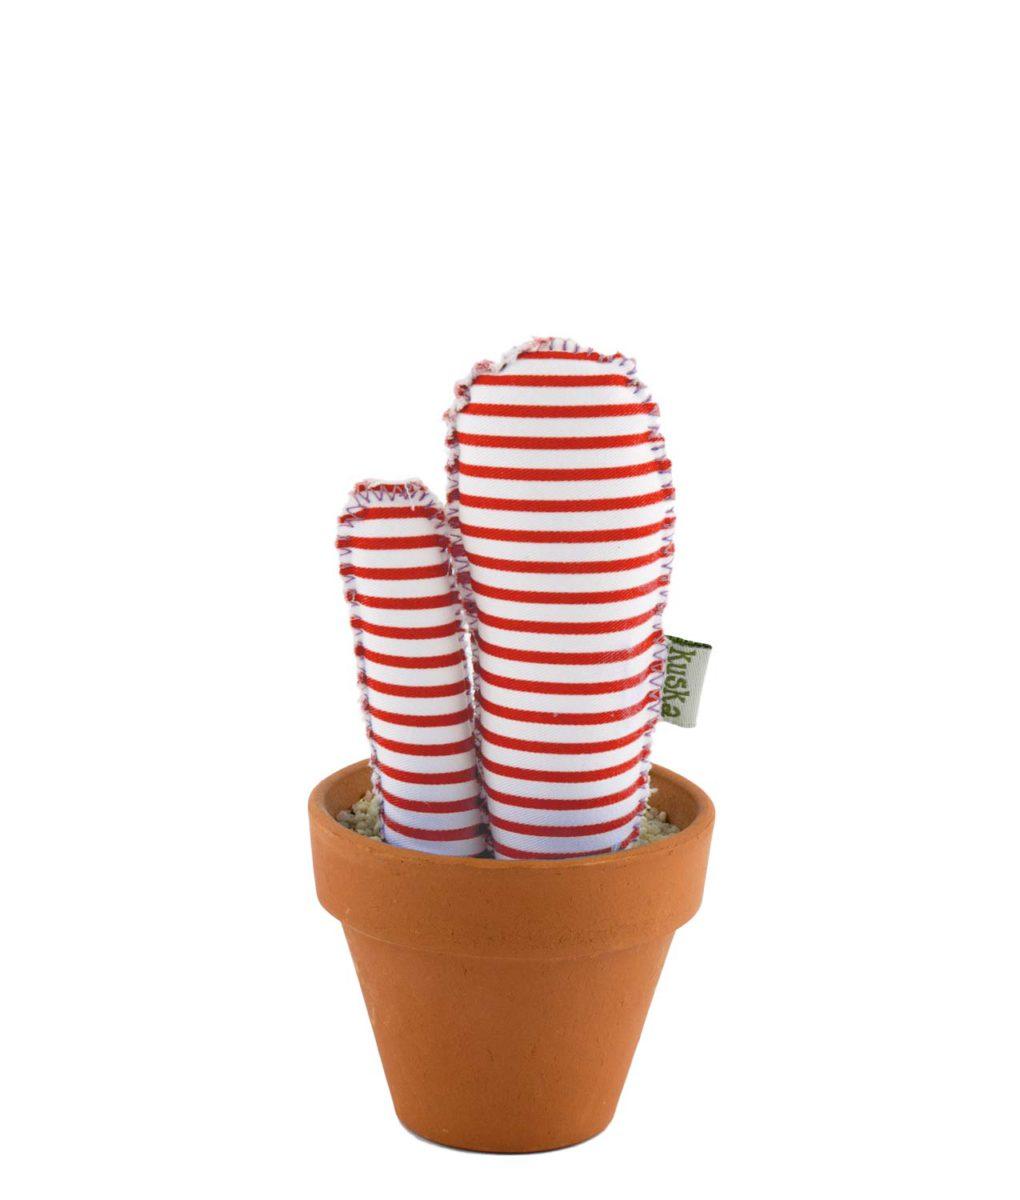 rayas-roja-cactus-pequeno-kuska